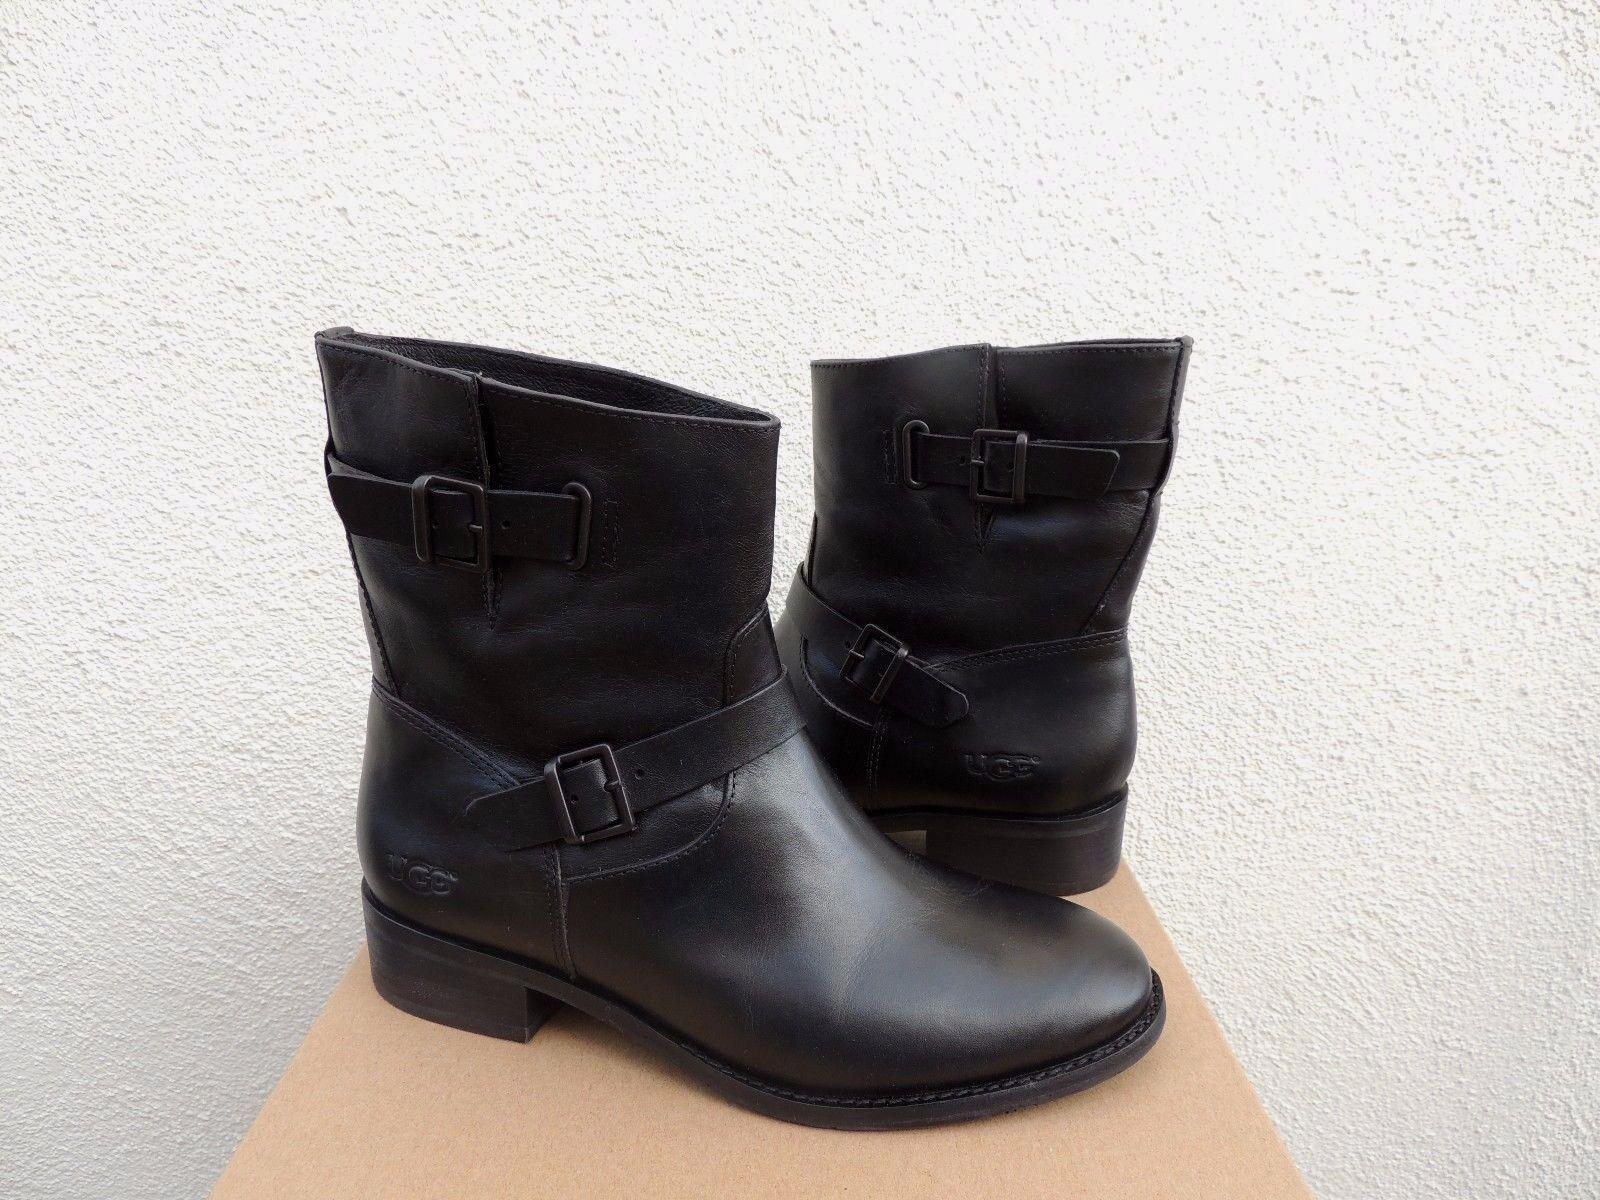 ea8841febc6 UGG Australia Fletcher Black Water Resistant Leather Women's Boot Size Size  9